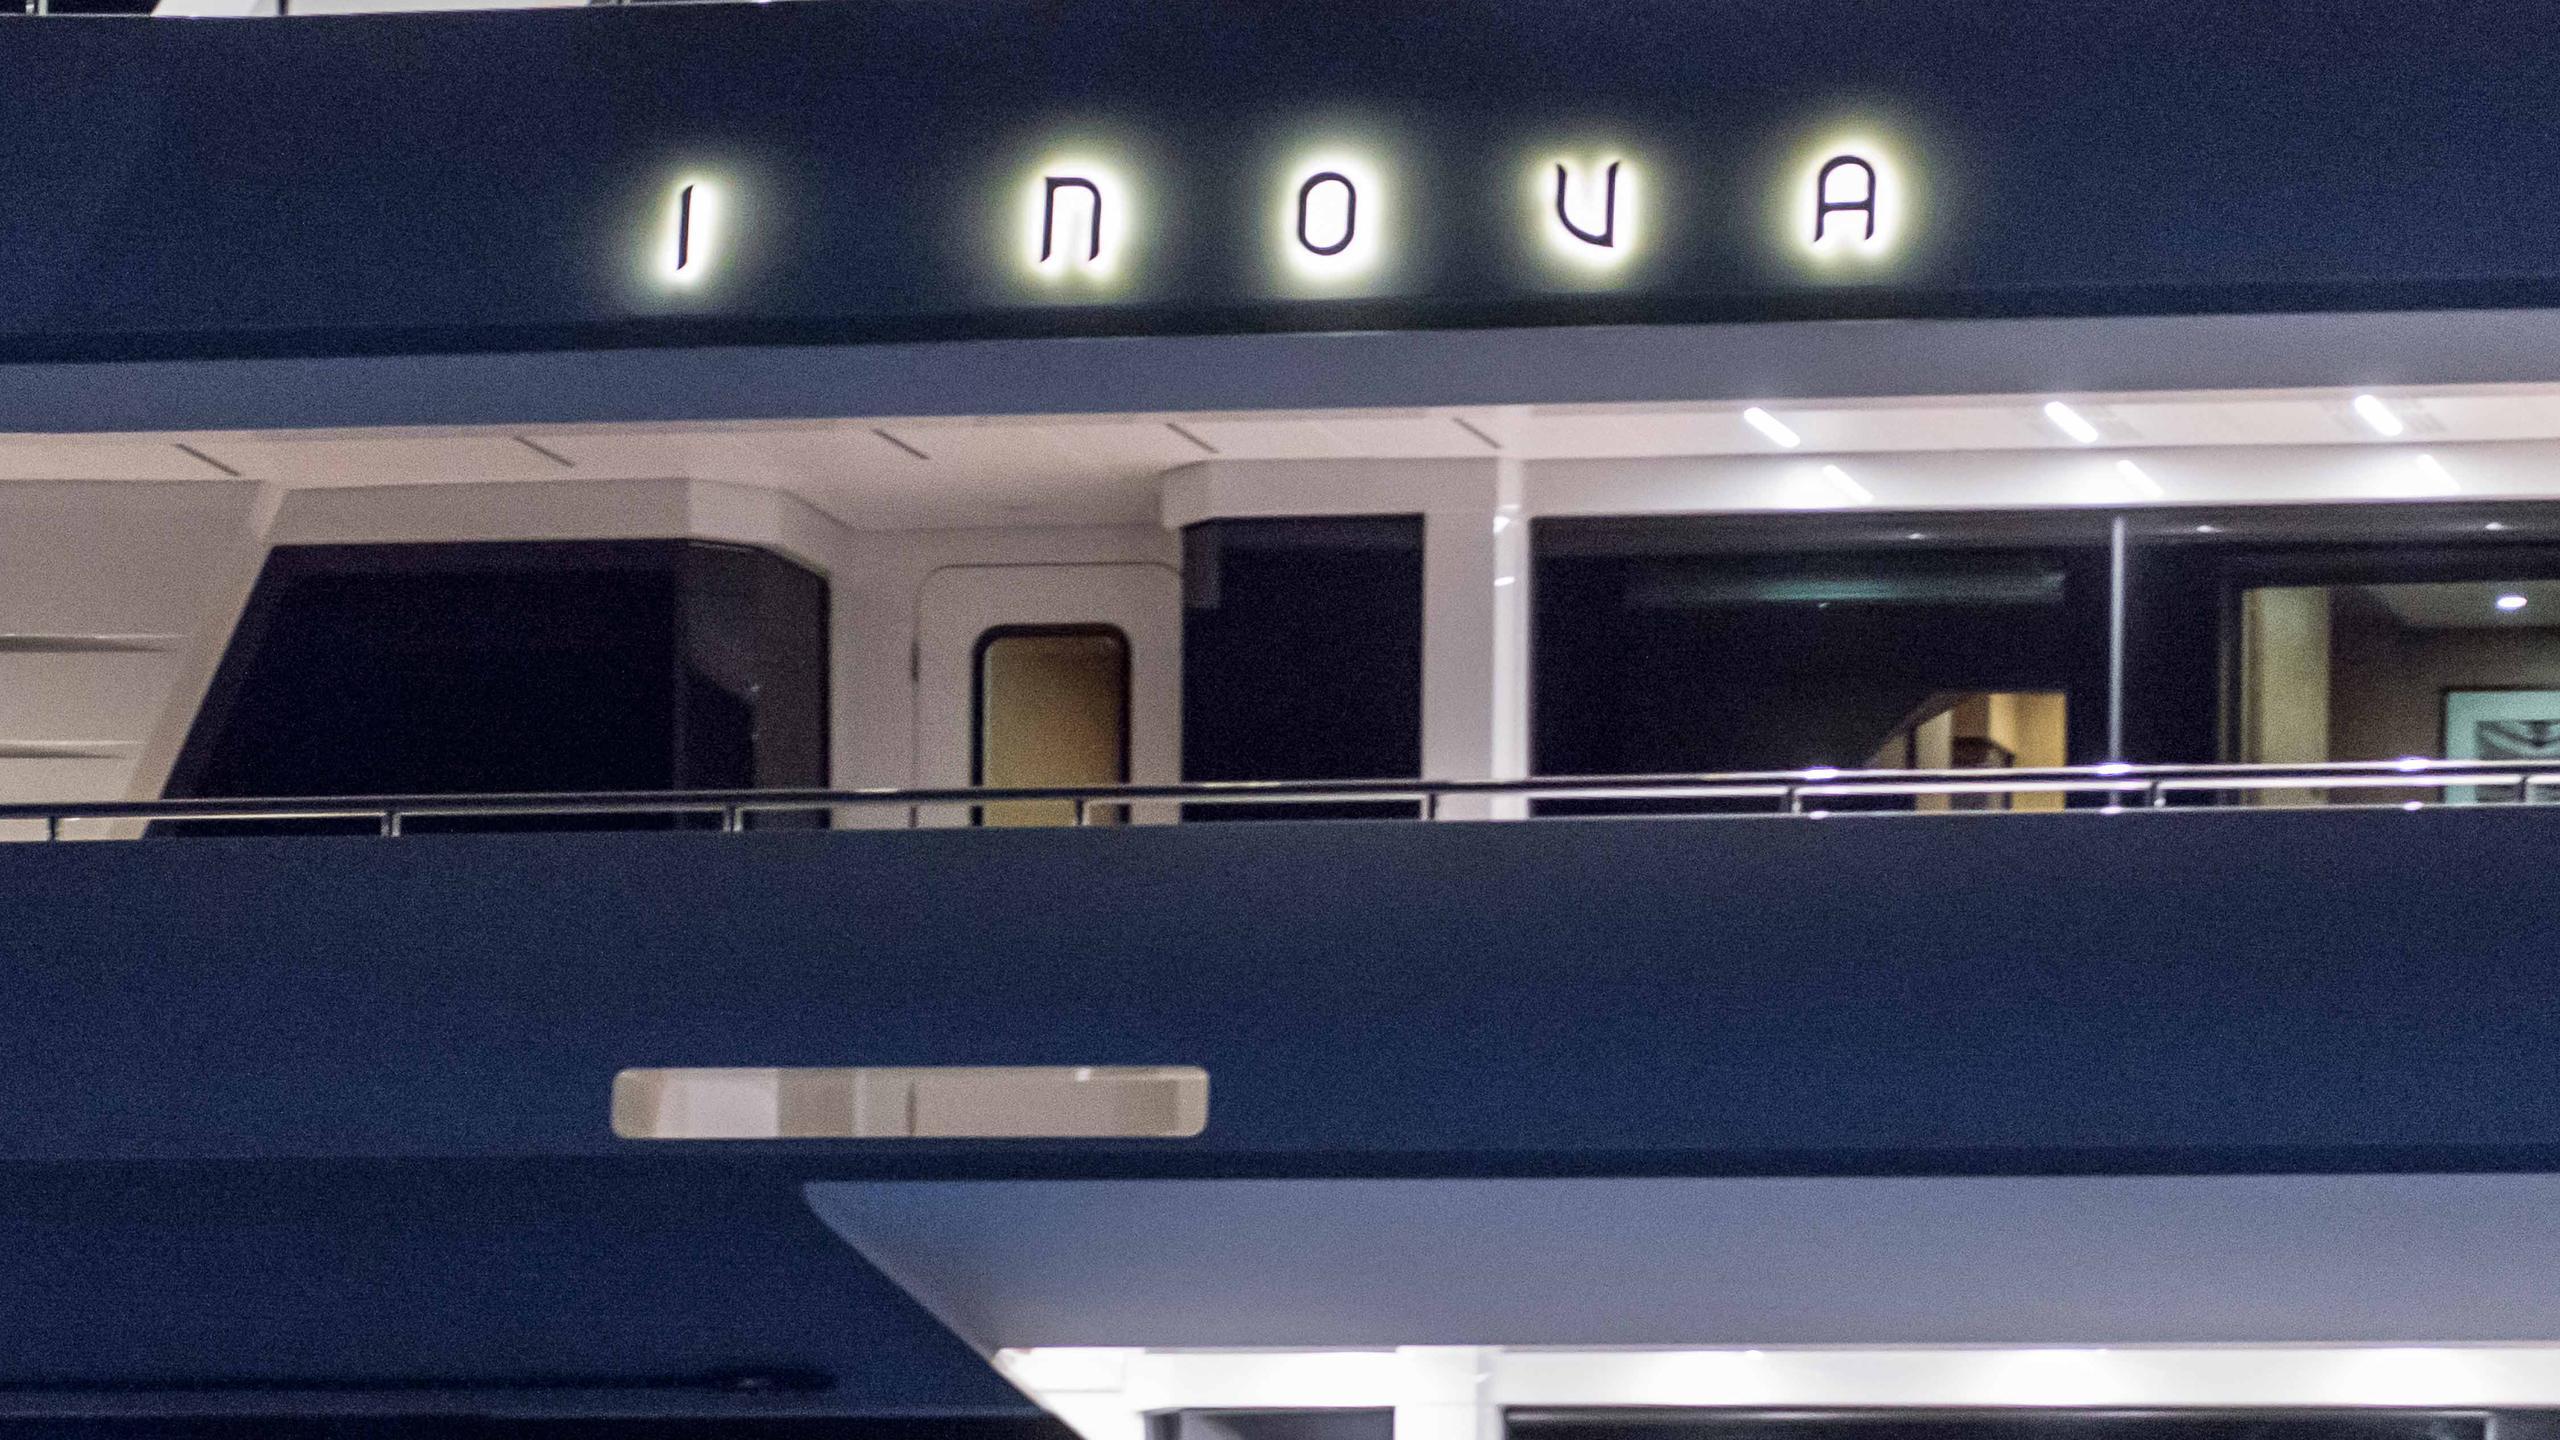 i-nova-explorer-yacht-cosmo-2013-50m-sideview-detail